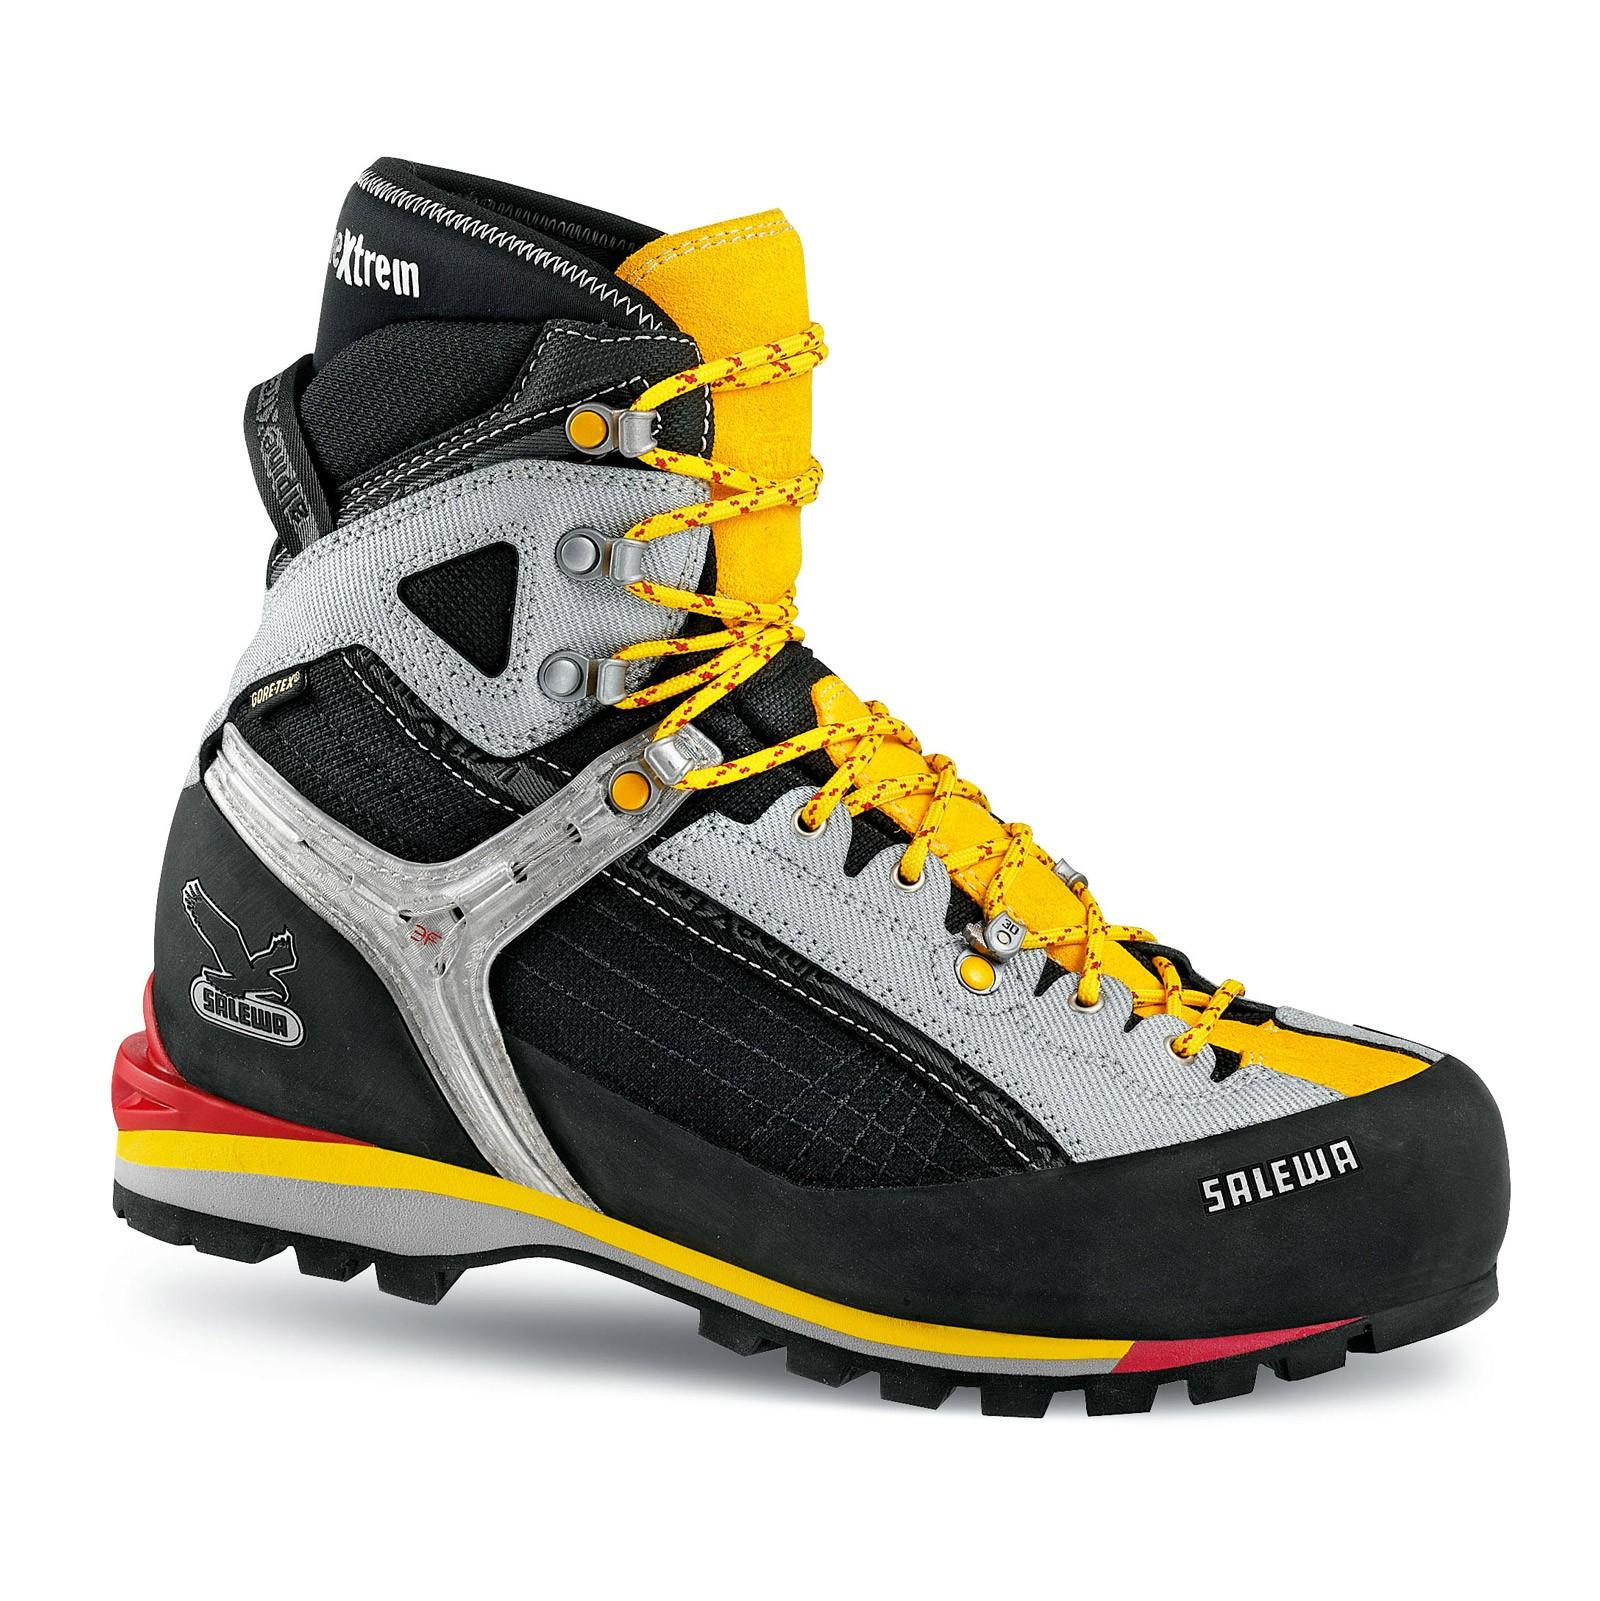 Foto salewa raven combi botas de monta a caballeros negro amarillo 42 5 foto 120053 - Funda vivac salewa ...